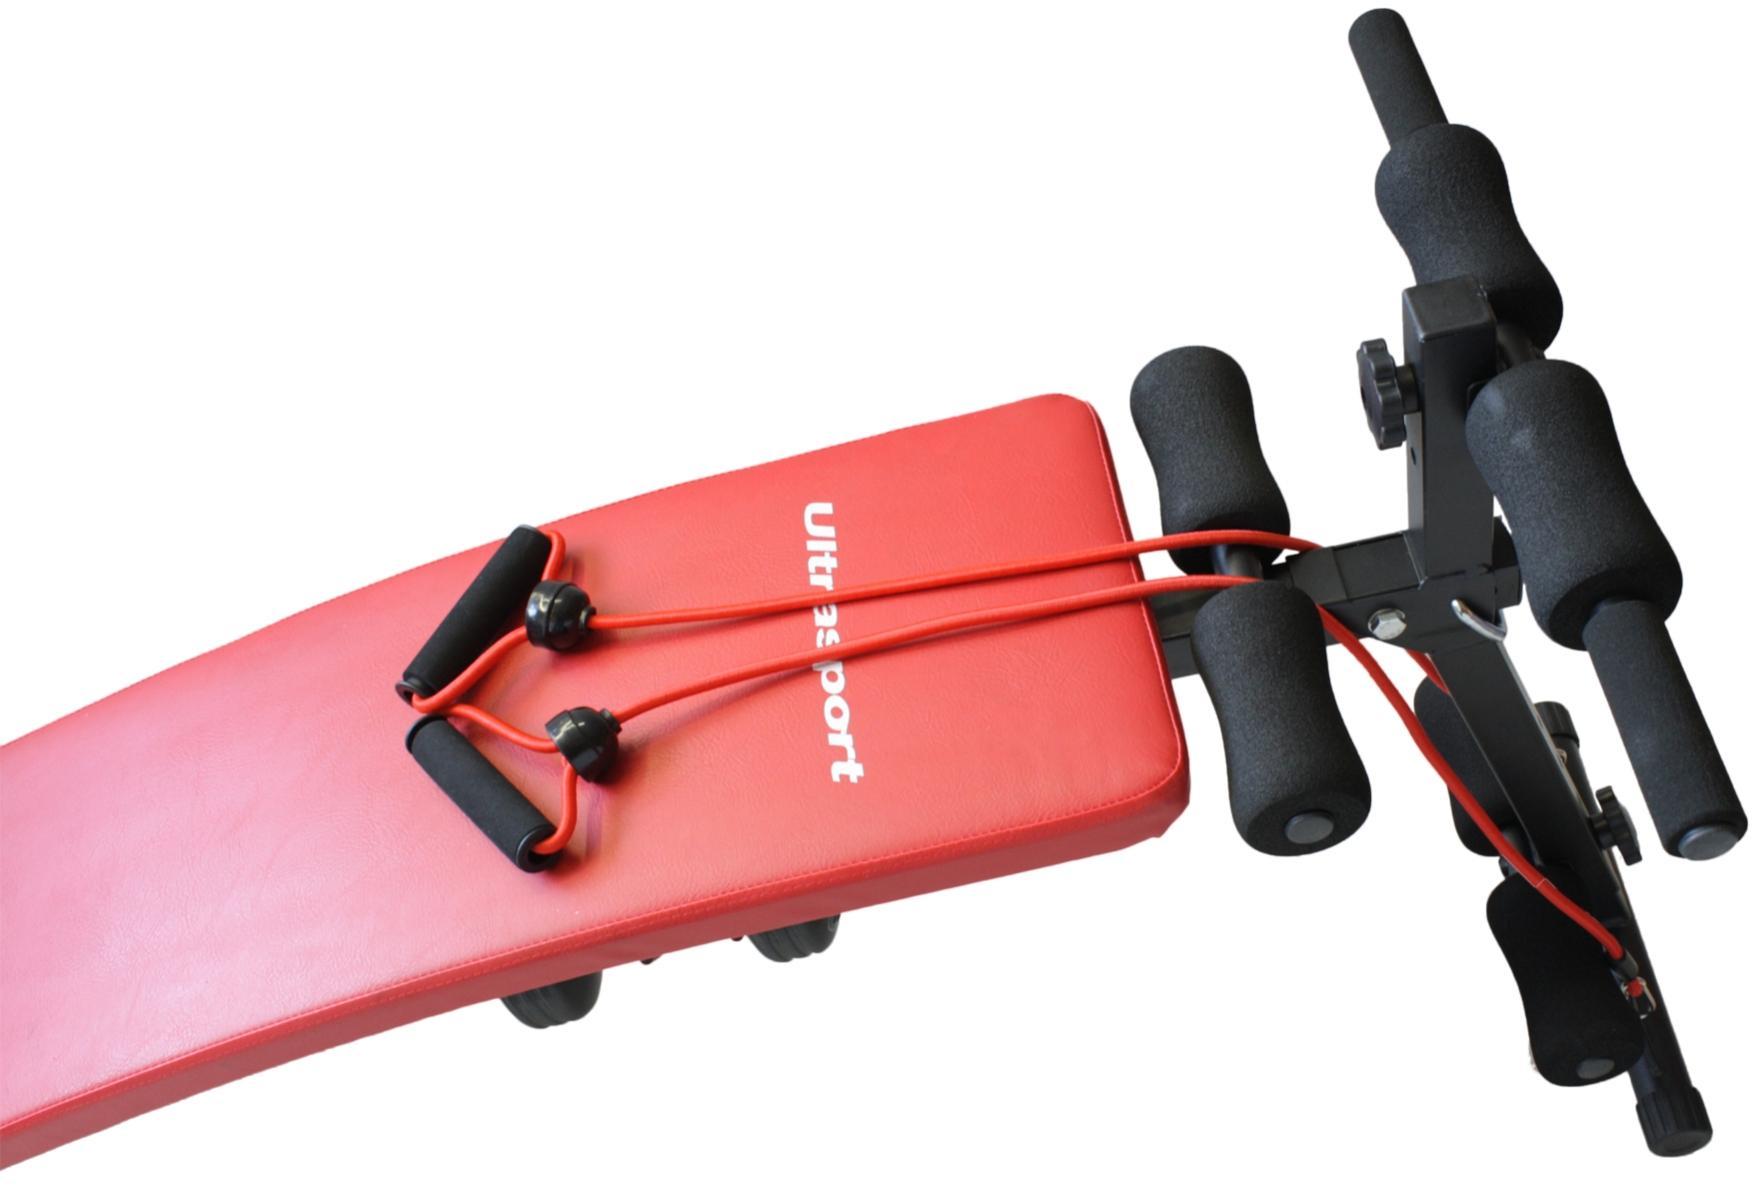 ultrasport banc abdos 3 en 1 appareil pour abdominaux. Black Bedroom Furniture Sets. Home Design Ideas